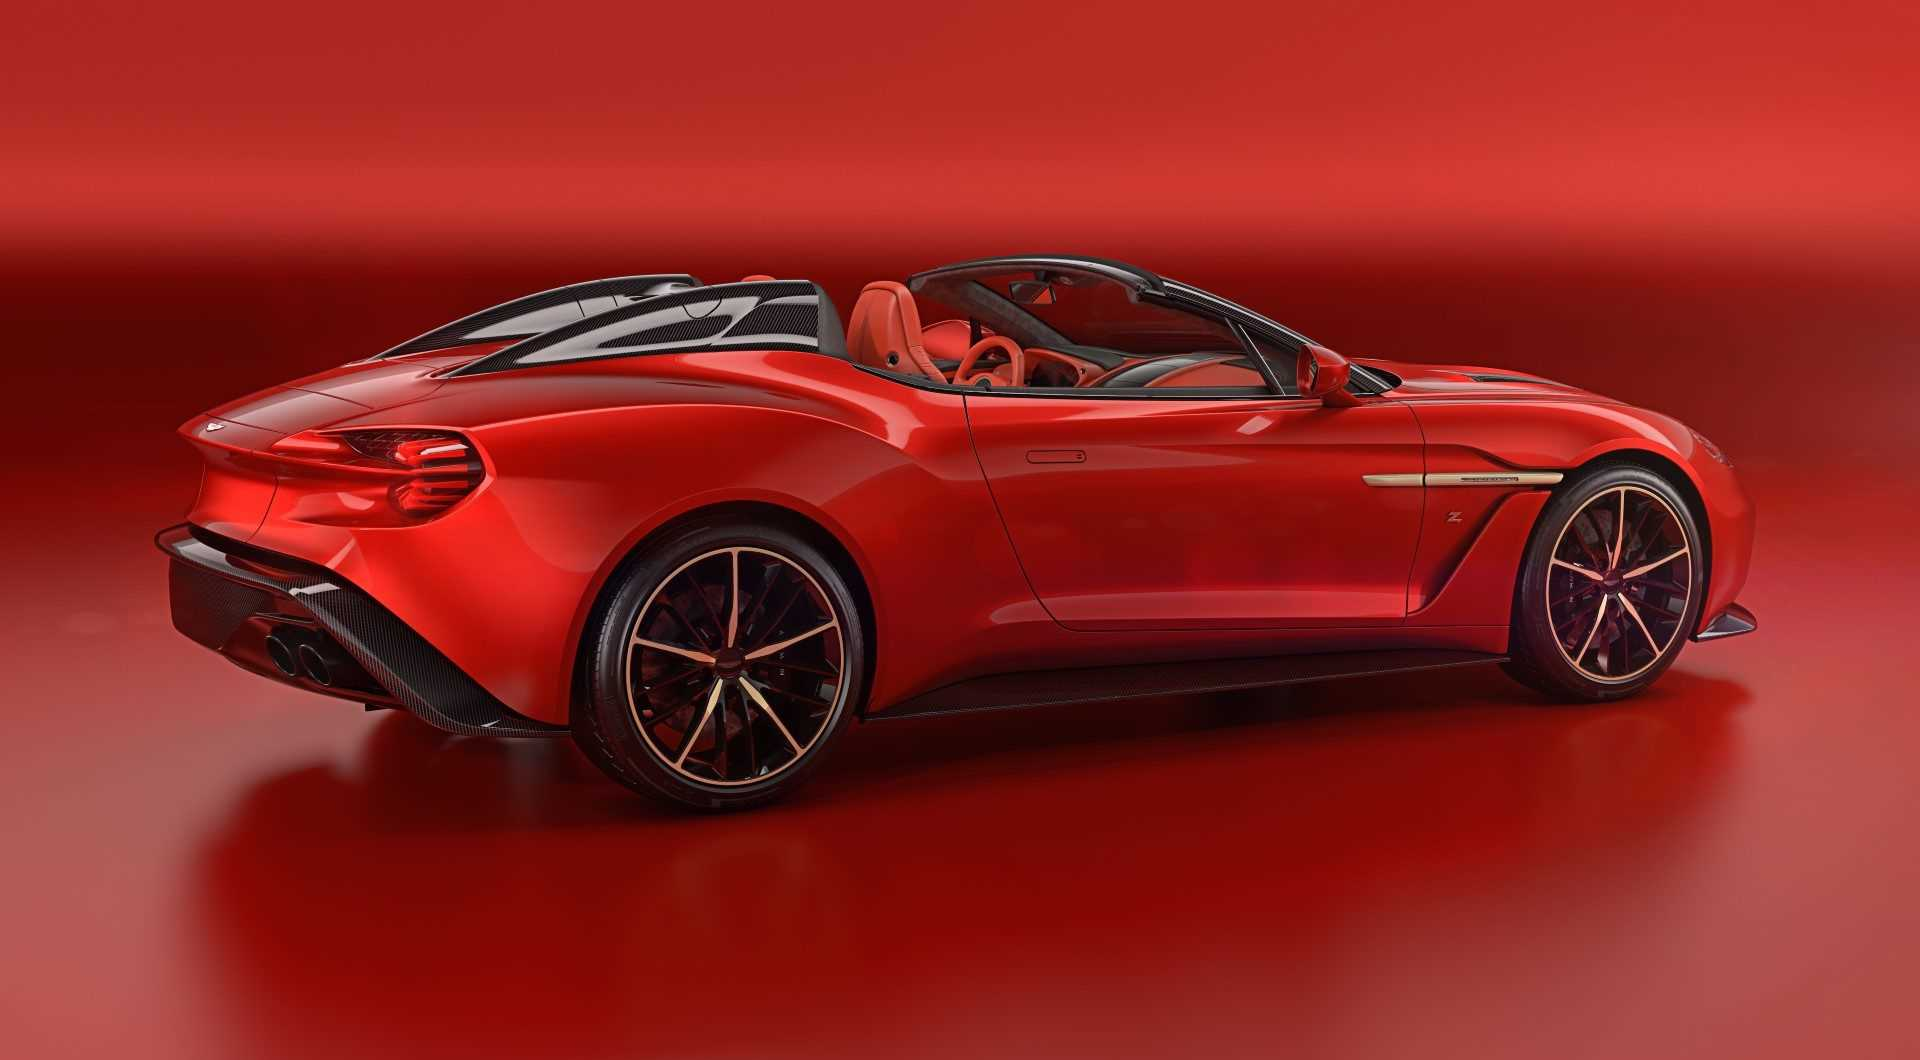 Aston Martin Vanquish Zagato Speedster 2017